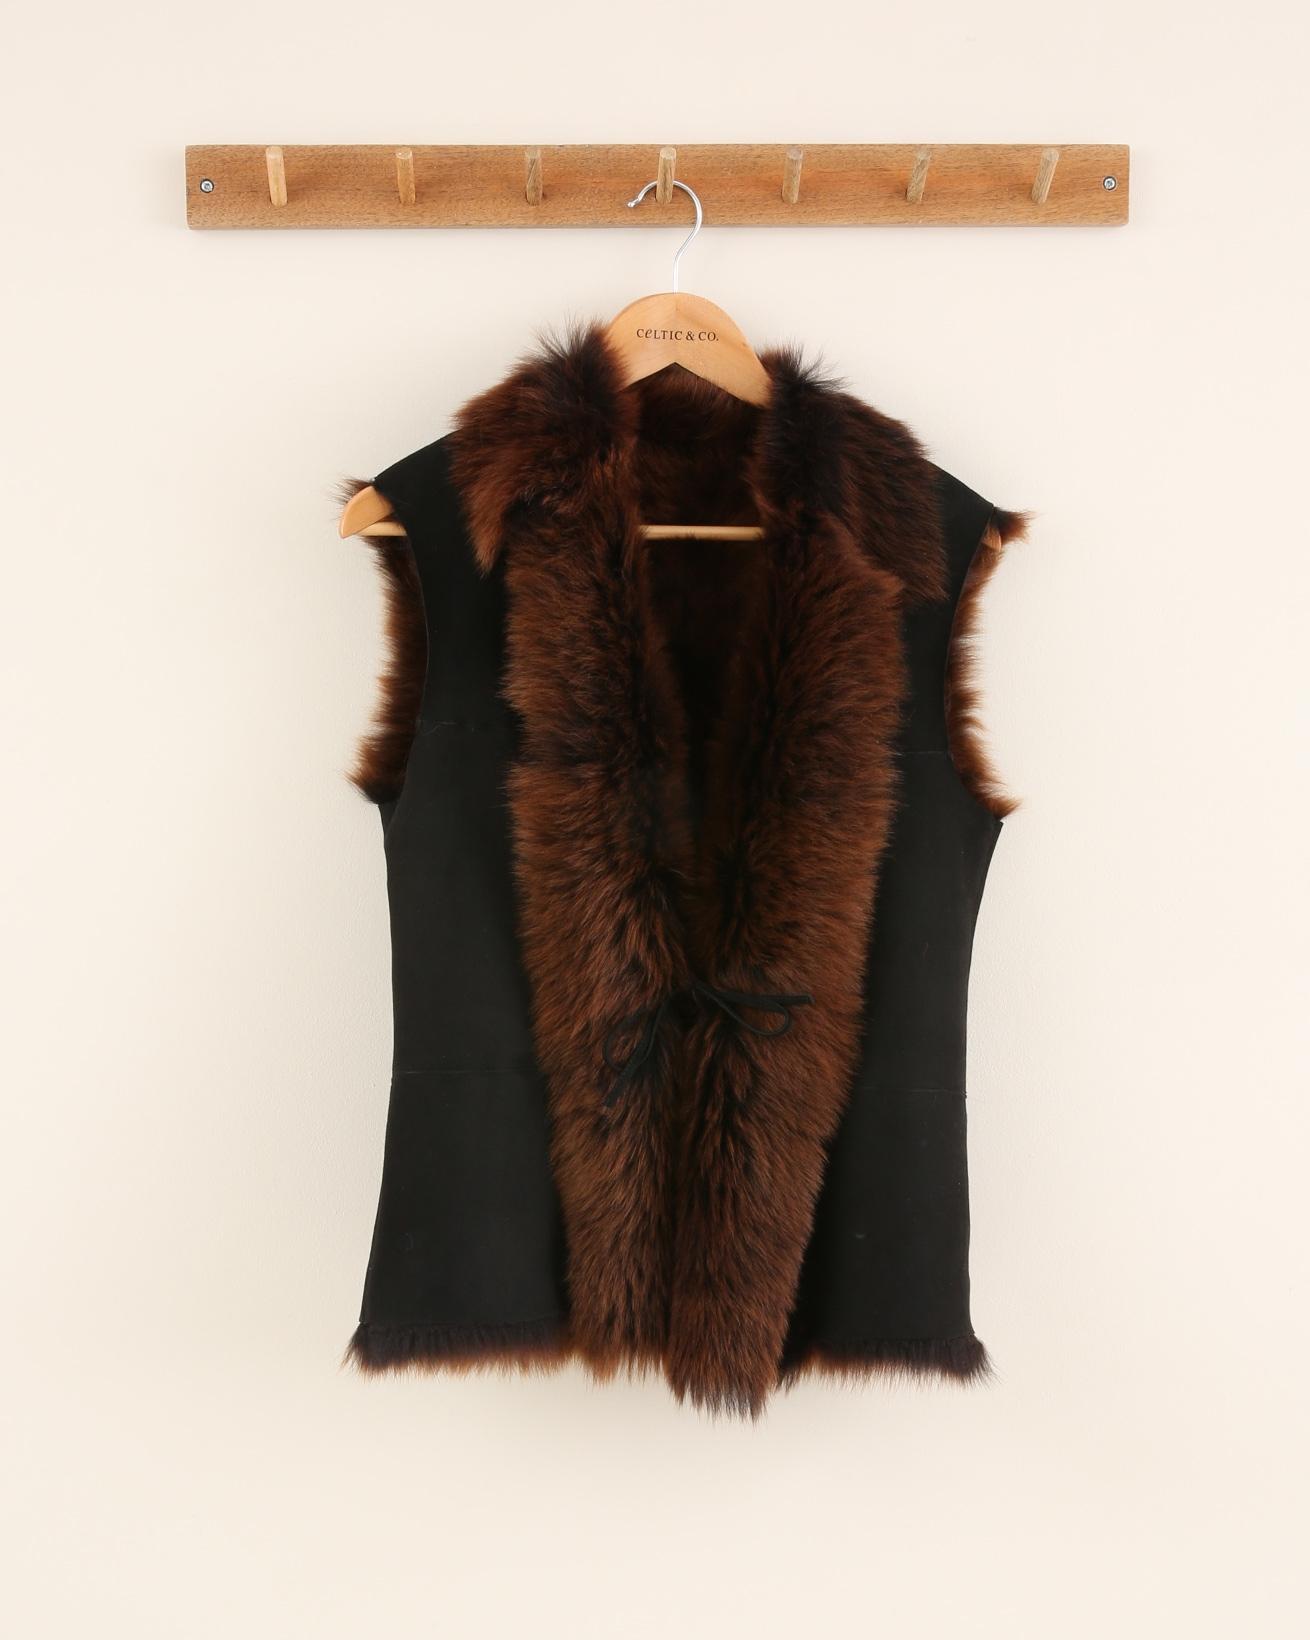 Toscana Gilet - Size 8 - Rust/Black - 2098